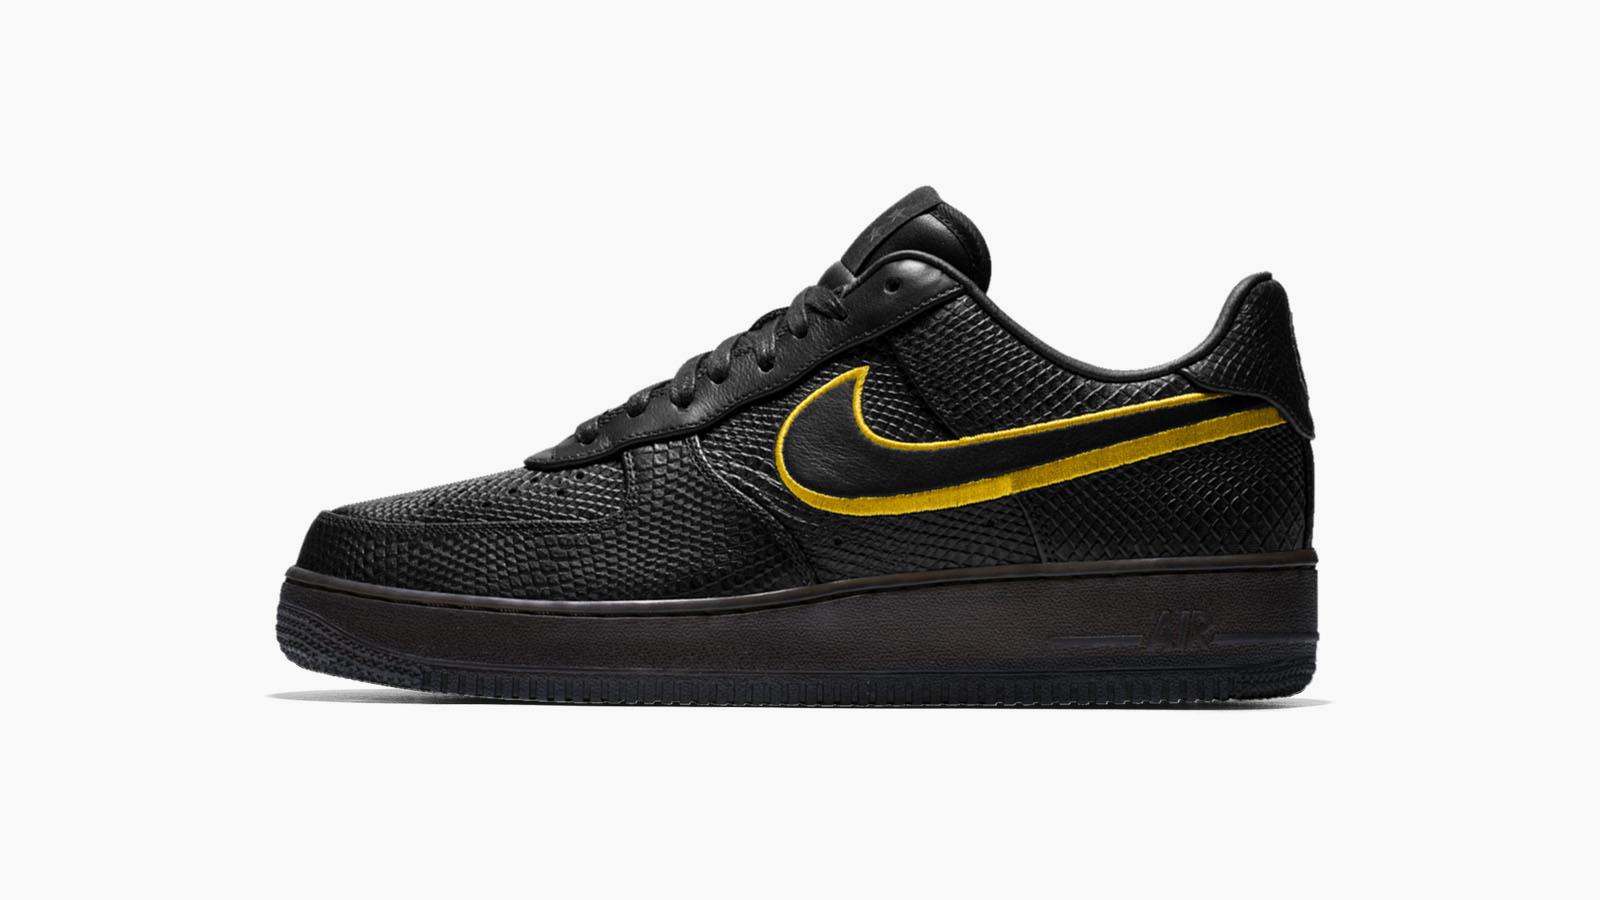 new style 724a9 1754e ... air force 1 3 · Basketball / Kicks Off Court / Nike / NikeiD ...